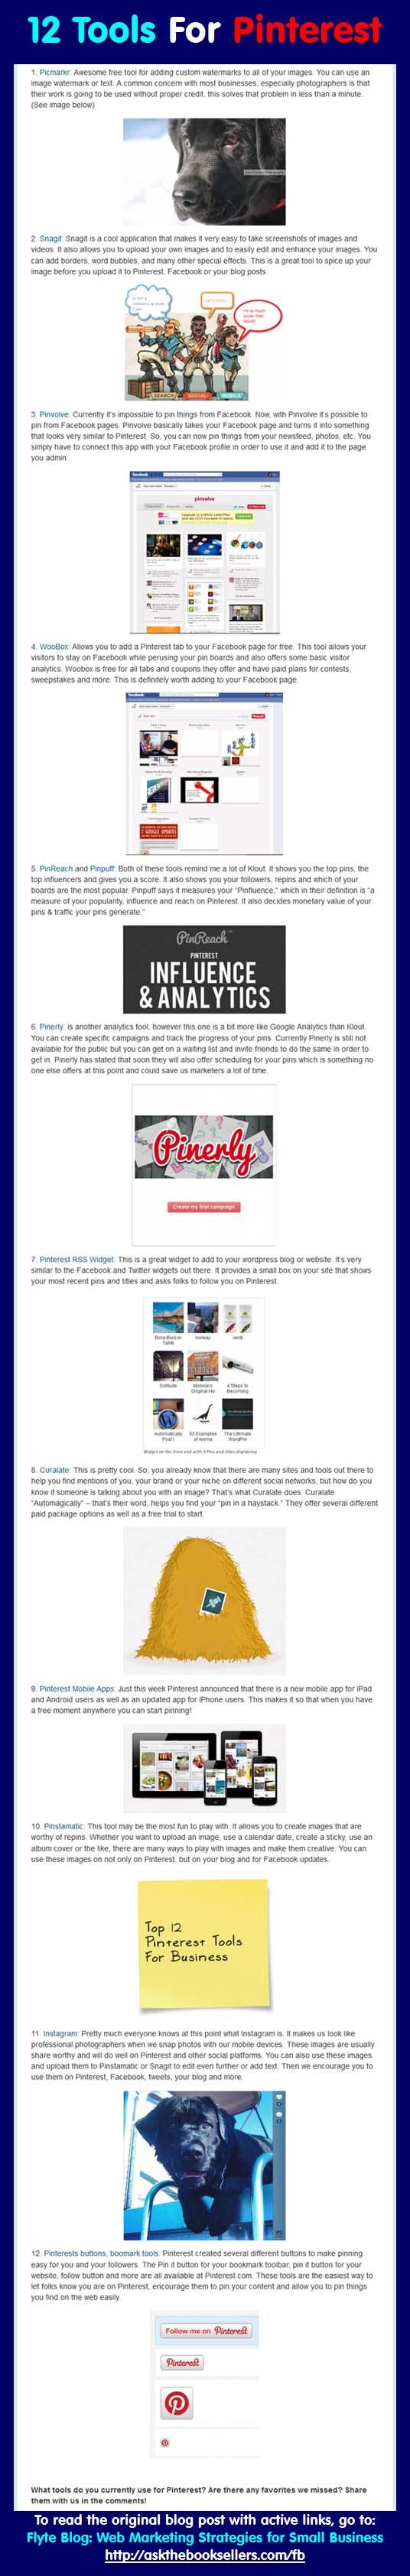 12 Pinterest Tools